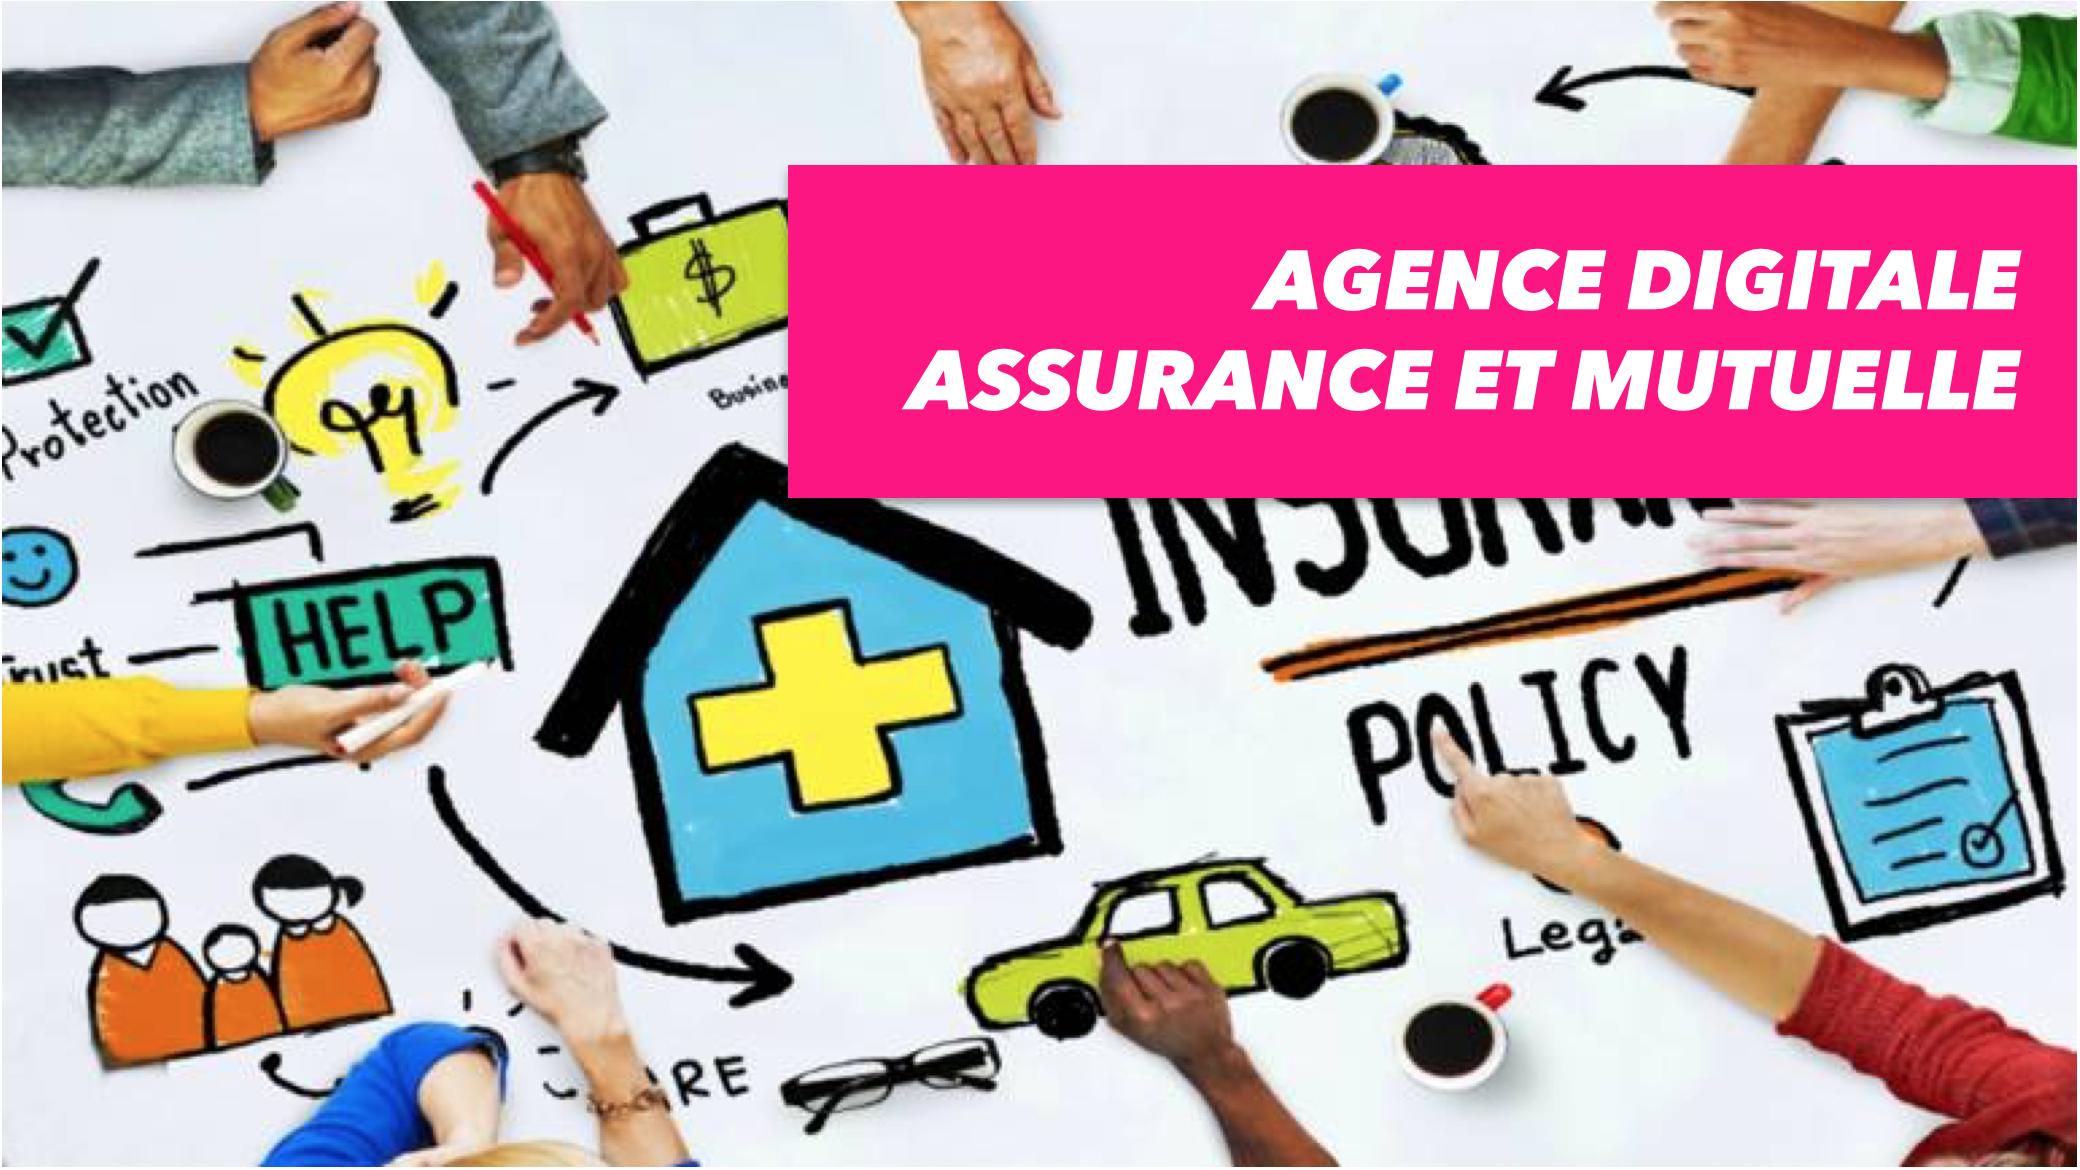 illustration agence digitale assurance